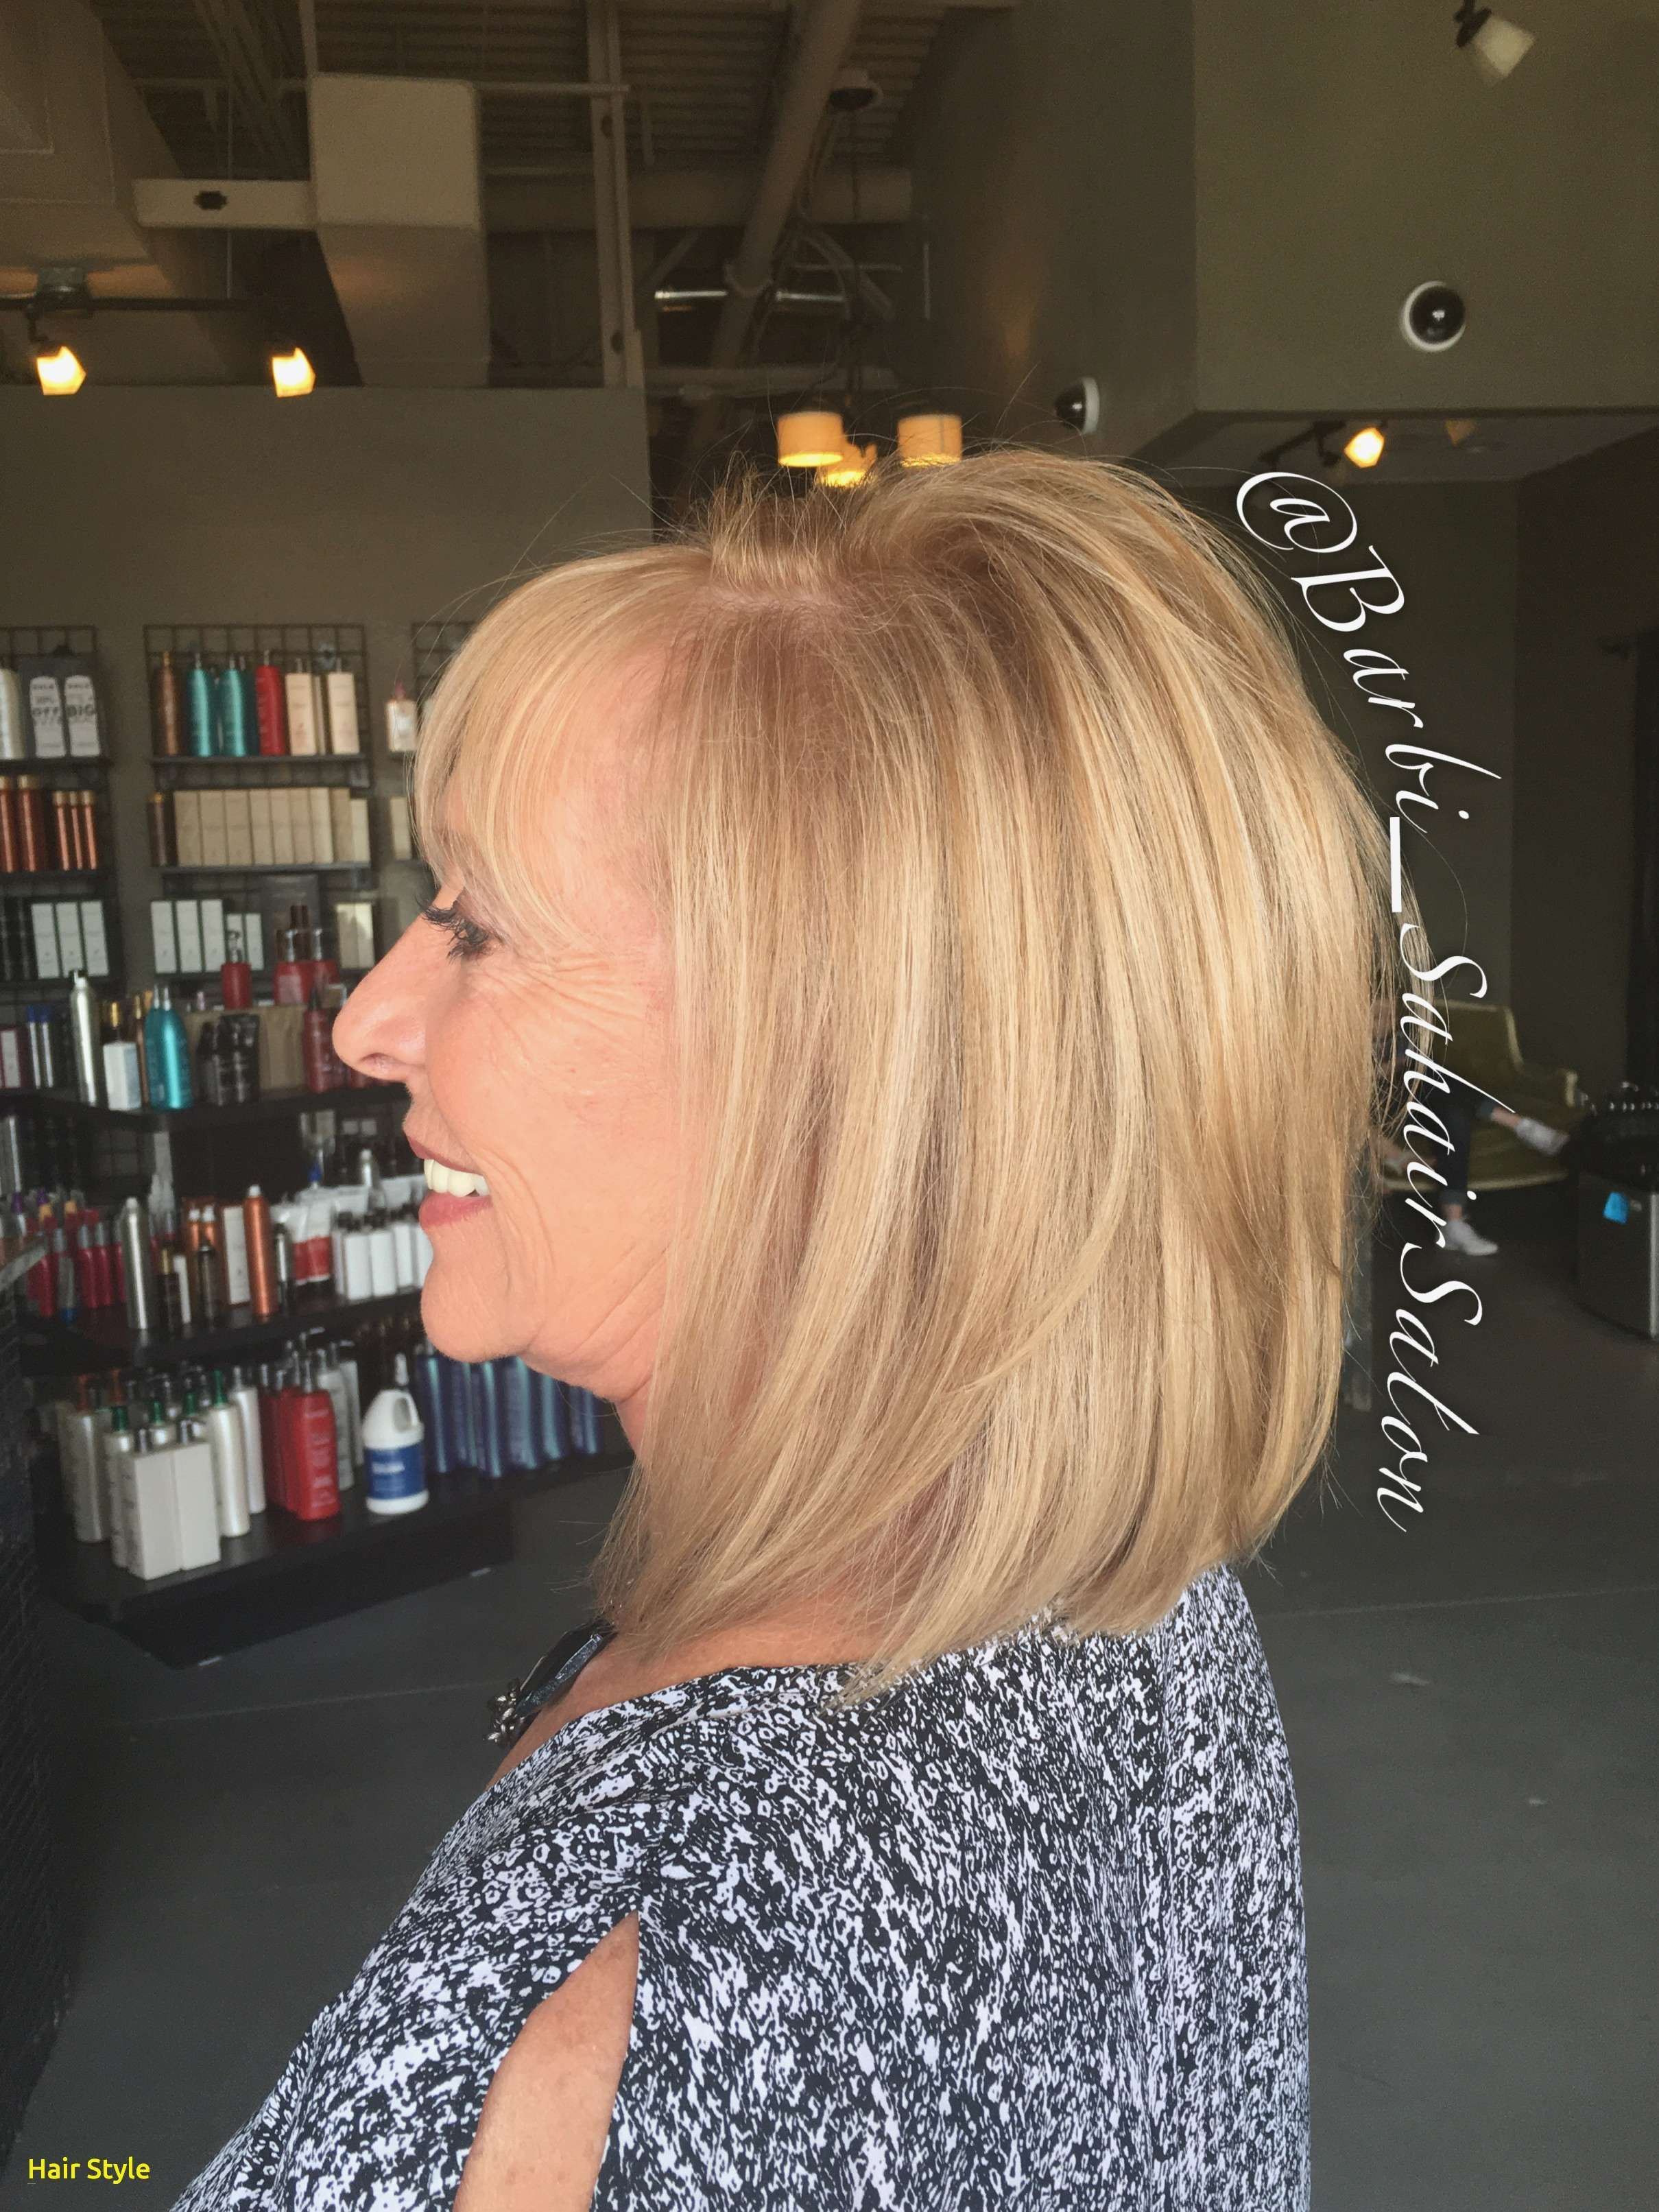 Schöne Mädchen Bob Haarschnitt Haartrends 2018 Pinterest Hair